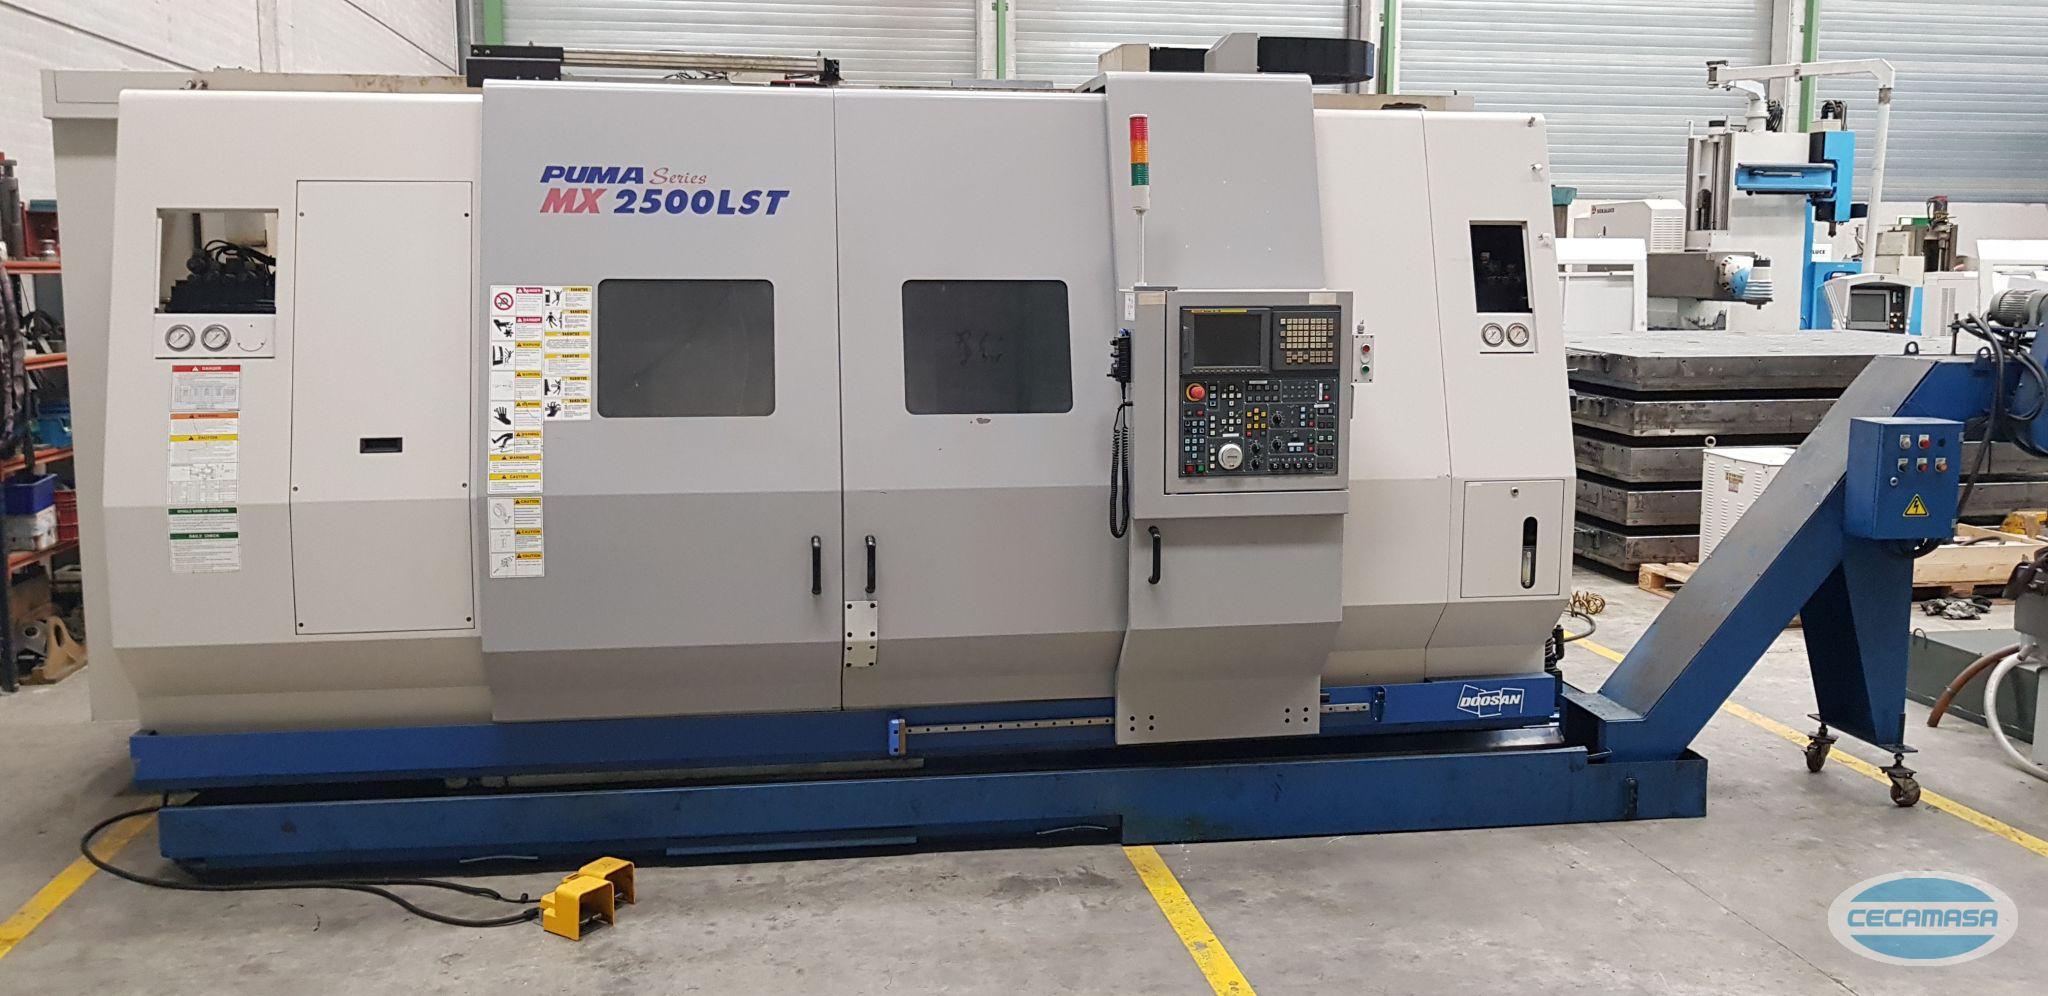 CNC-Drehmaschine DOOSAN PUMA MX 2500 LST OCCASION